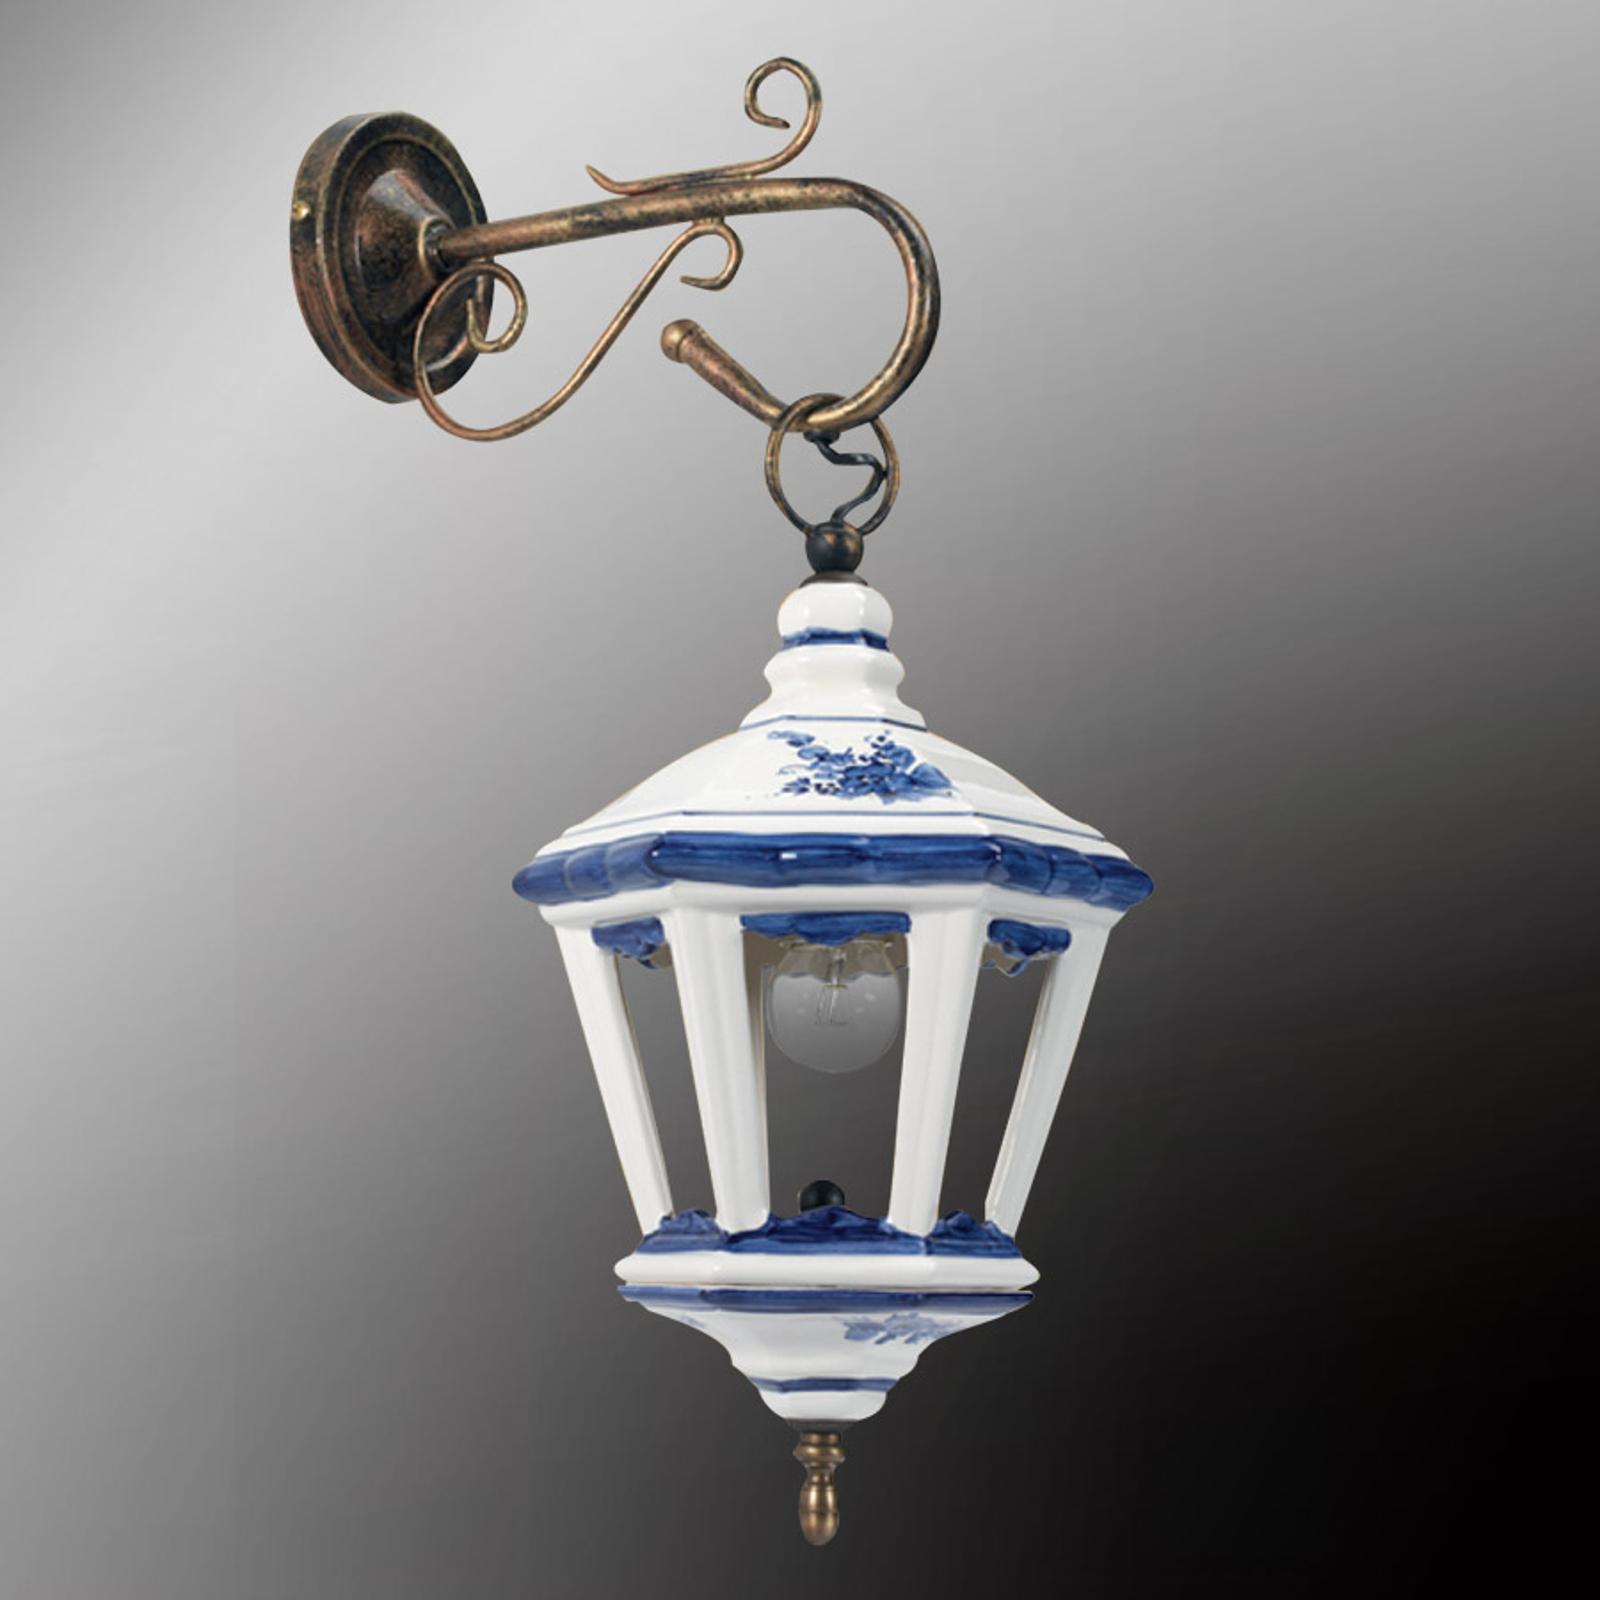 Applique Viola con lanterna di ceramica